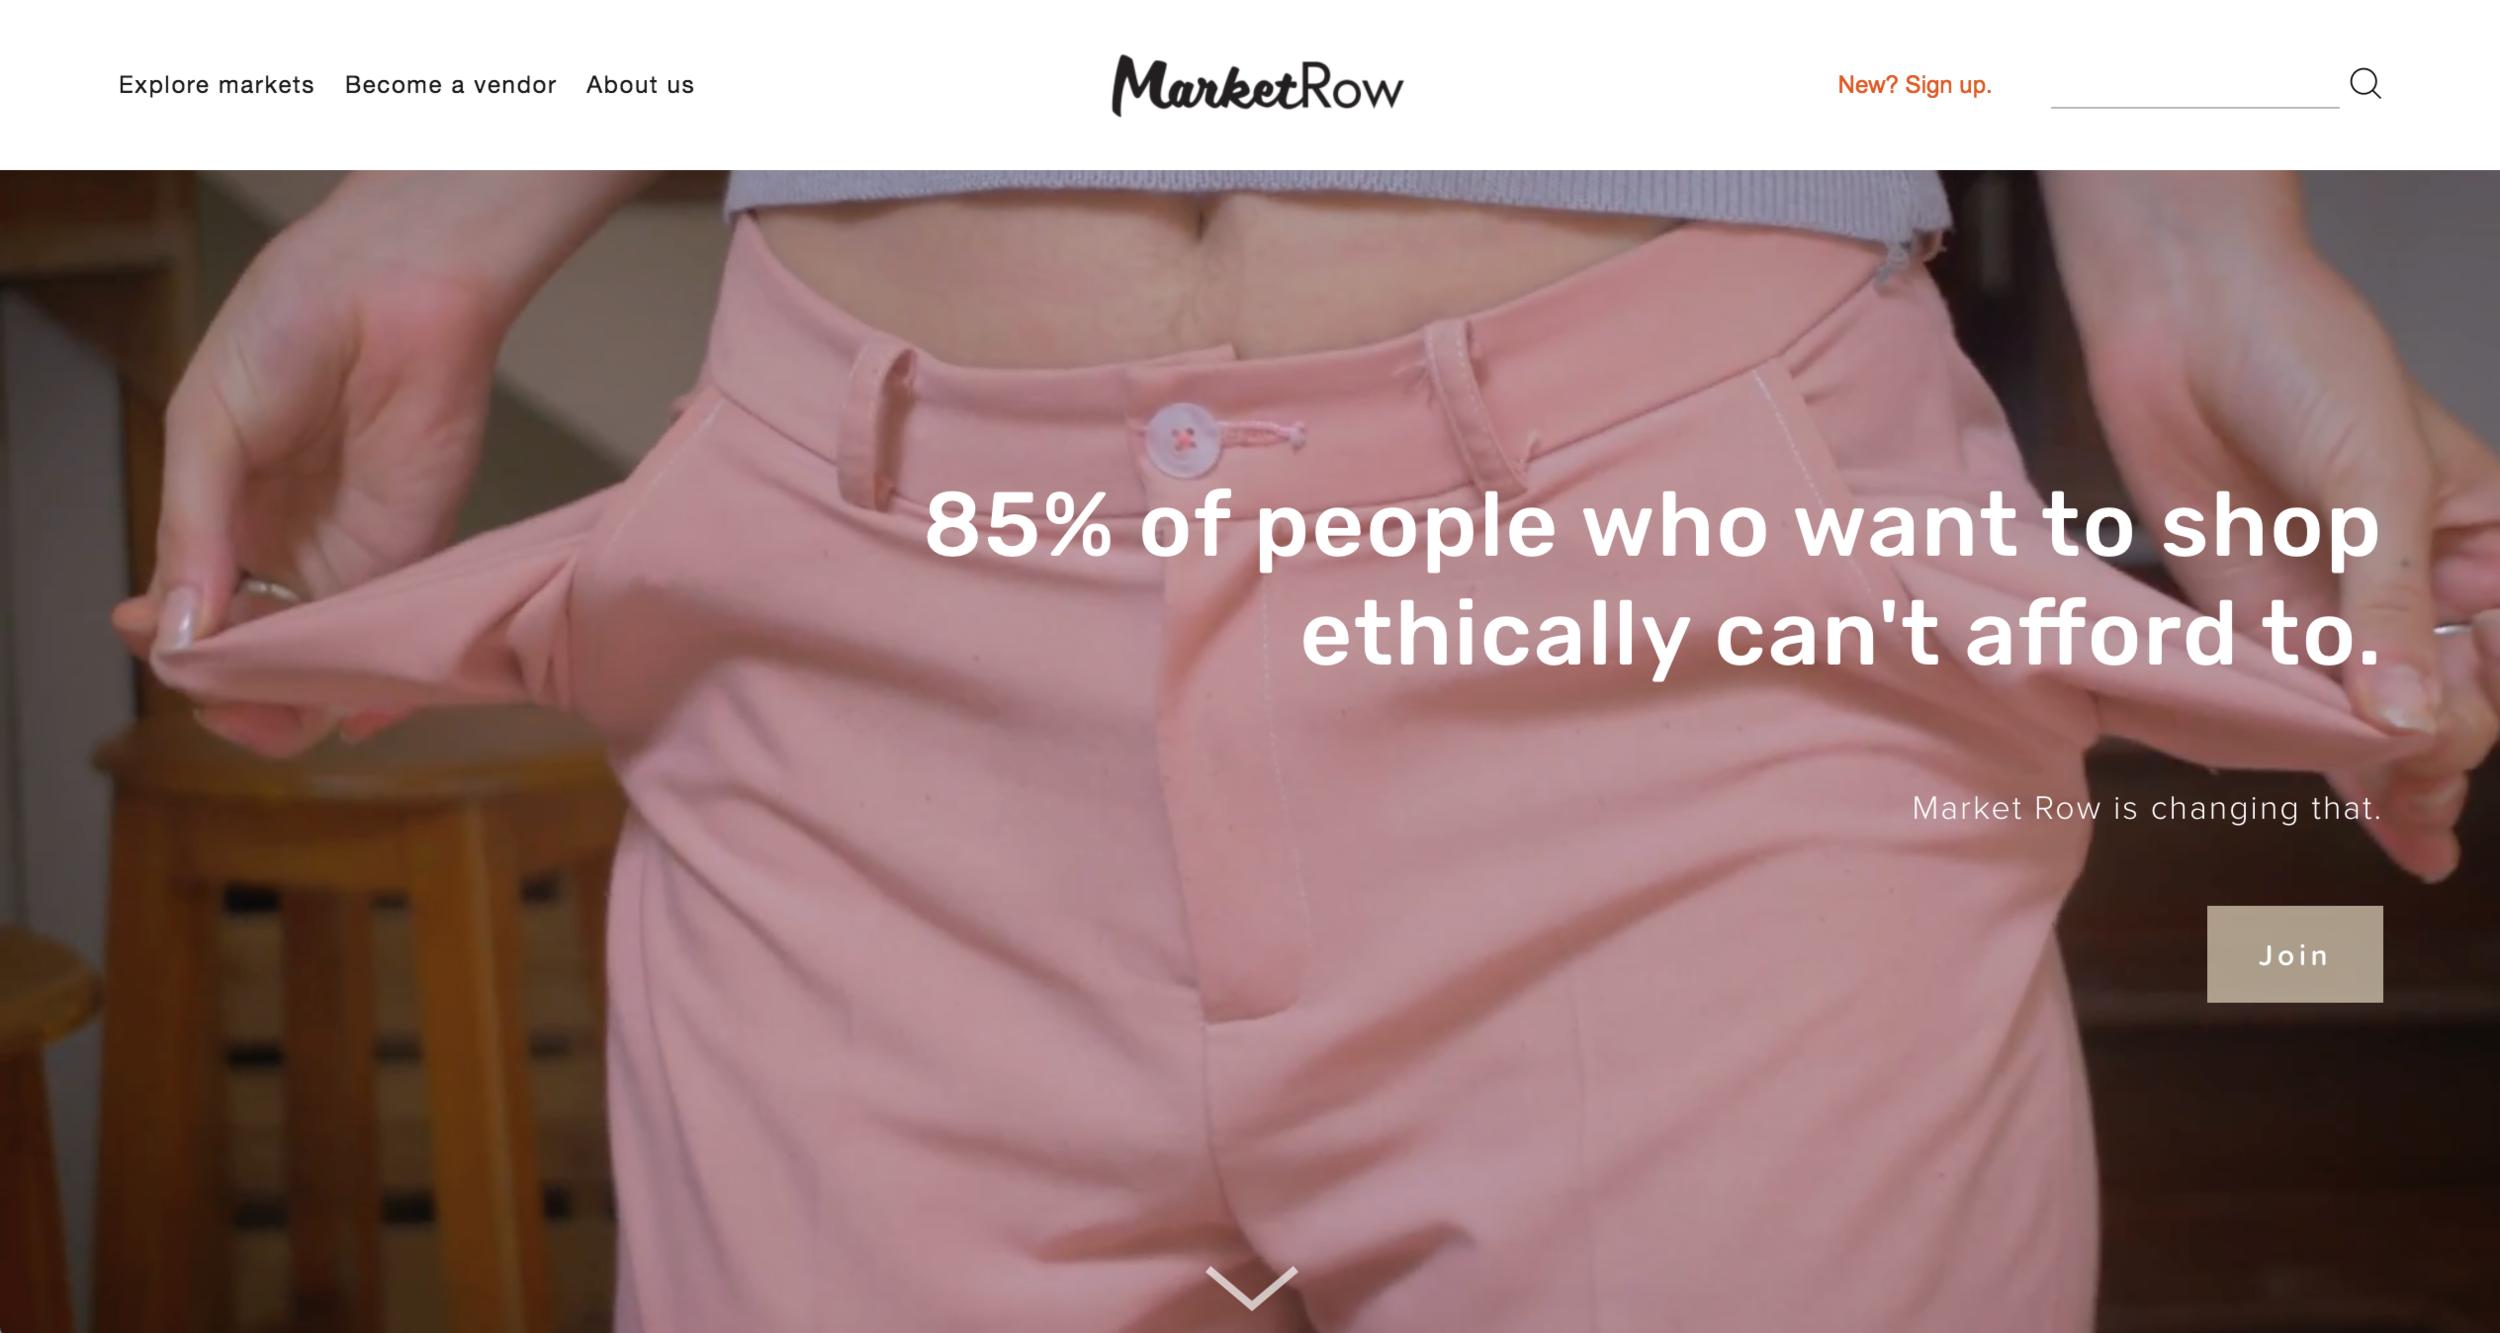 MarketRow